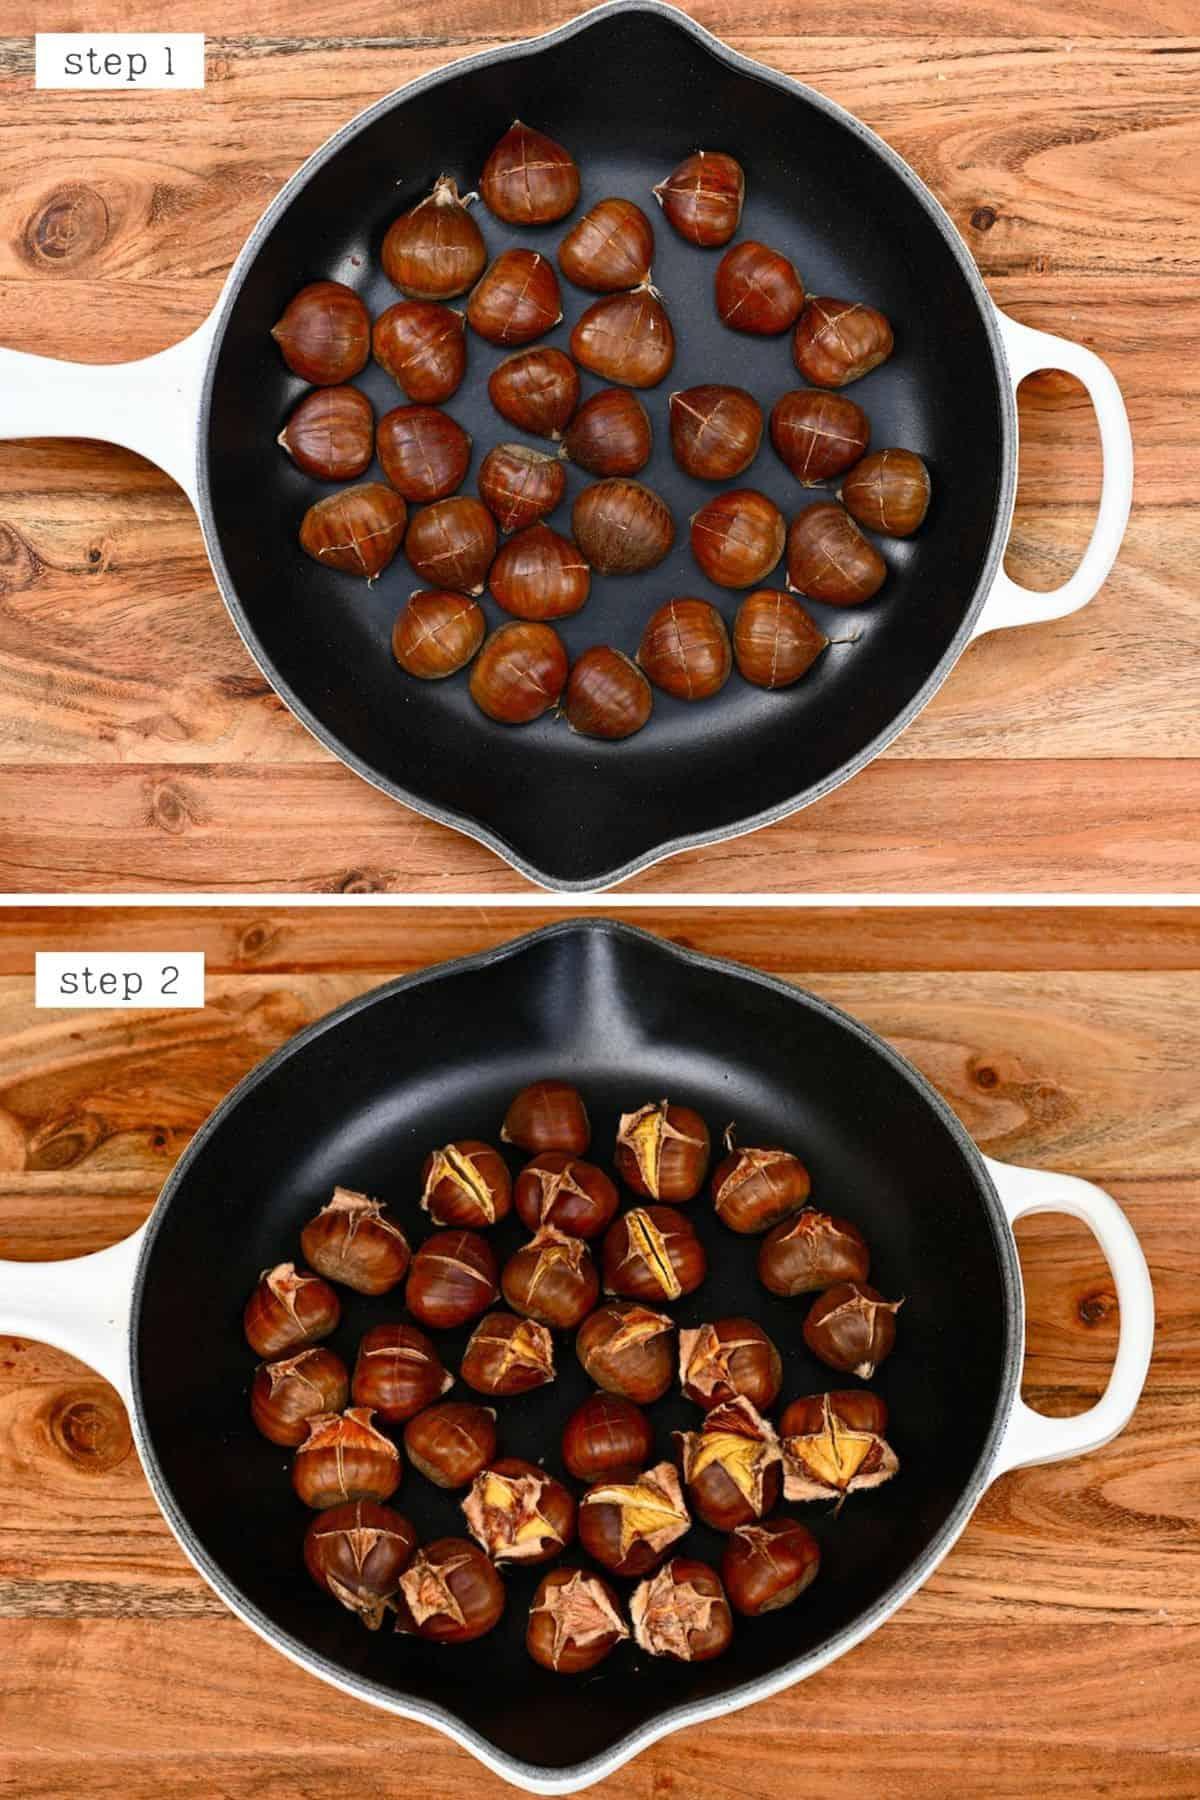 Steps for roasting chestnuts